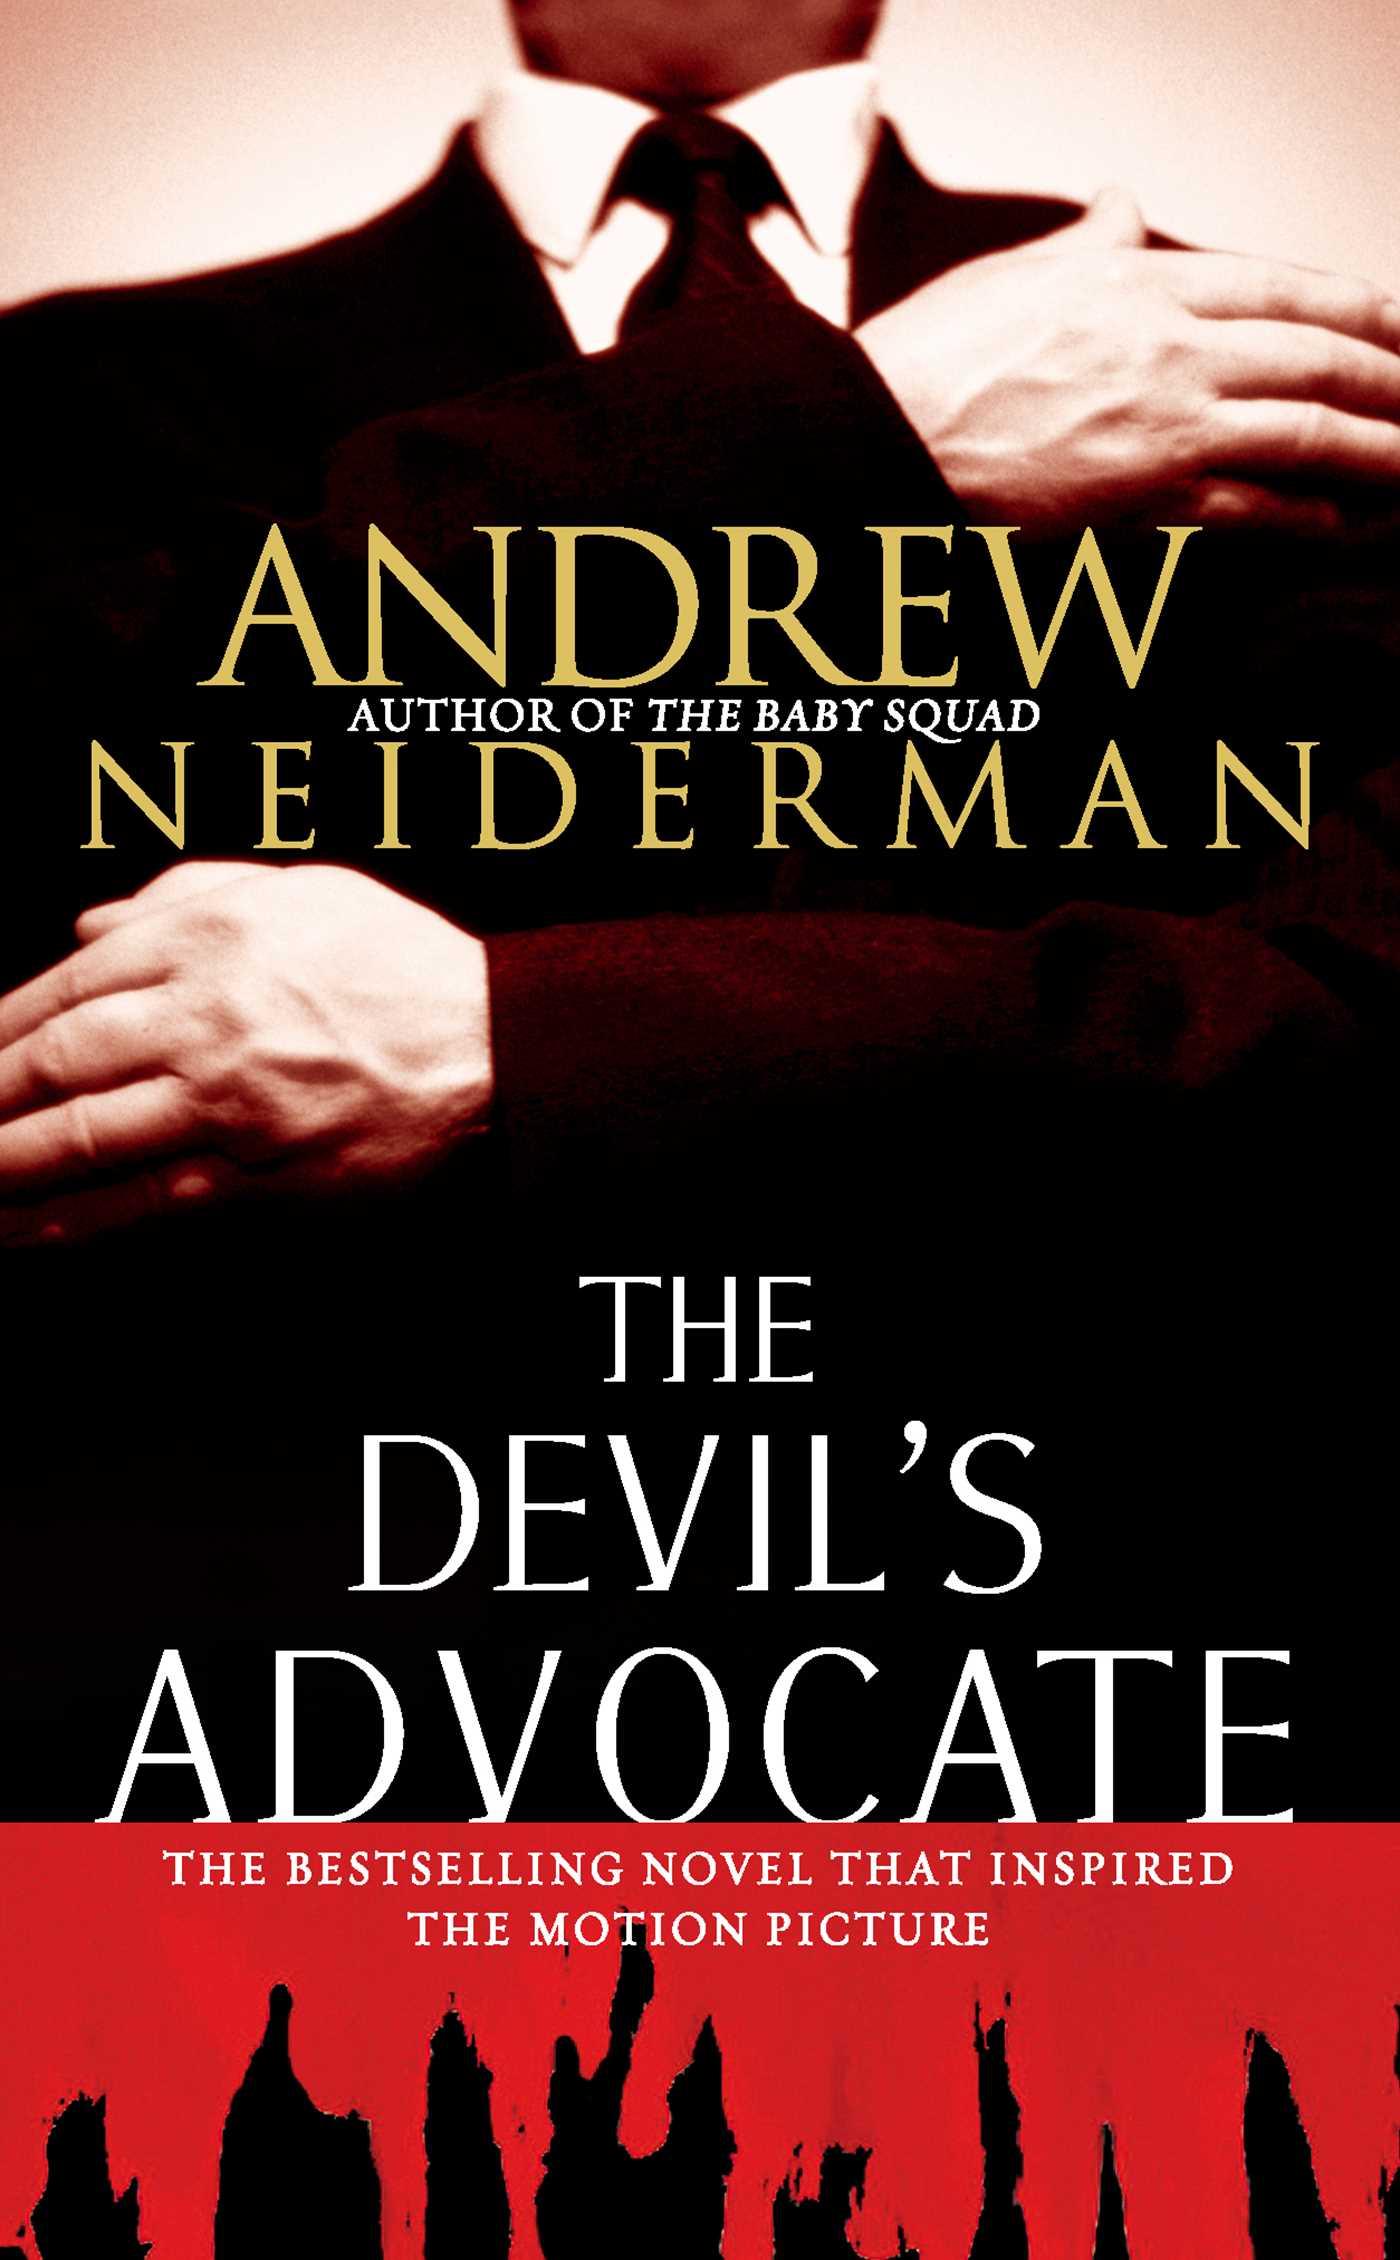 The devils advocate 9781451682557 hr